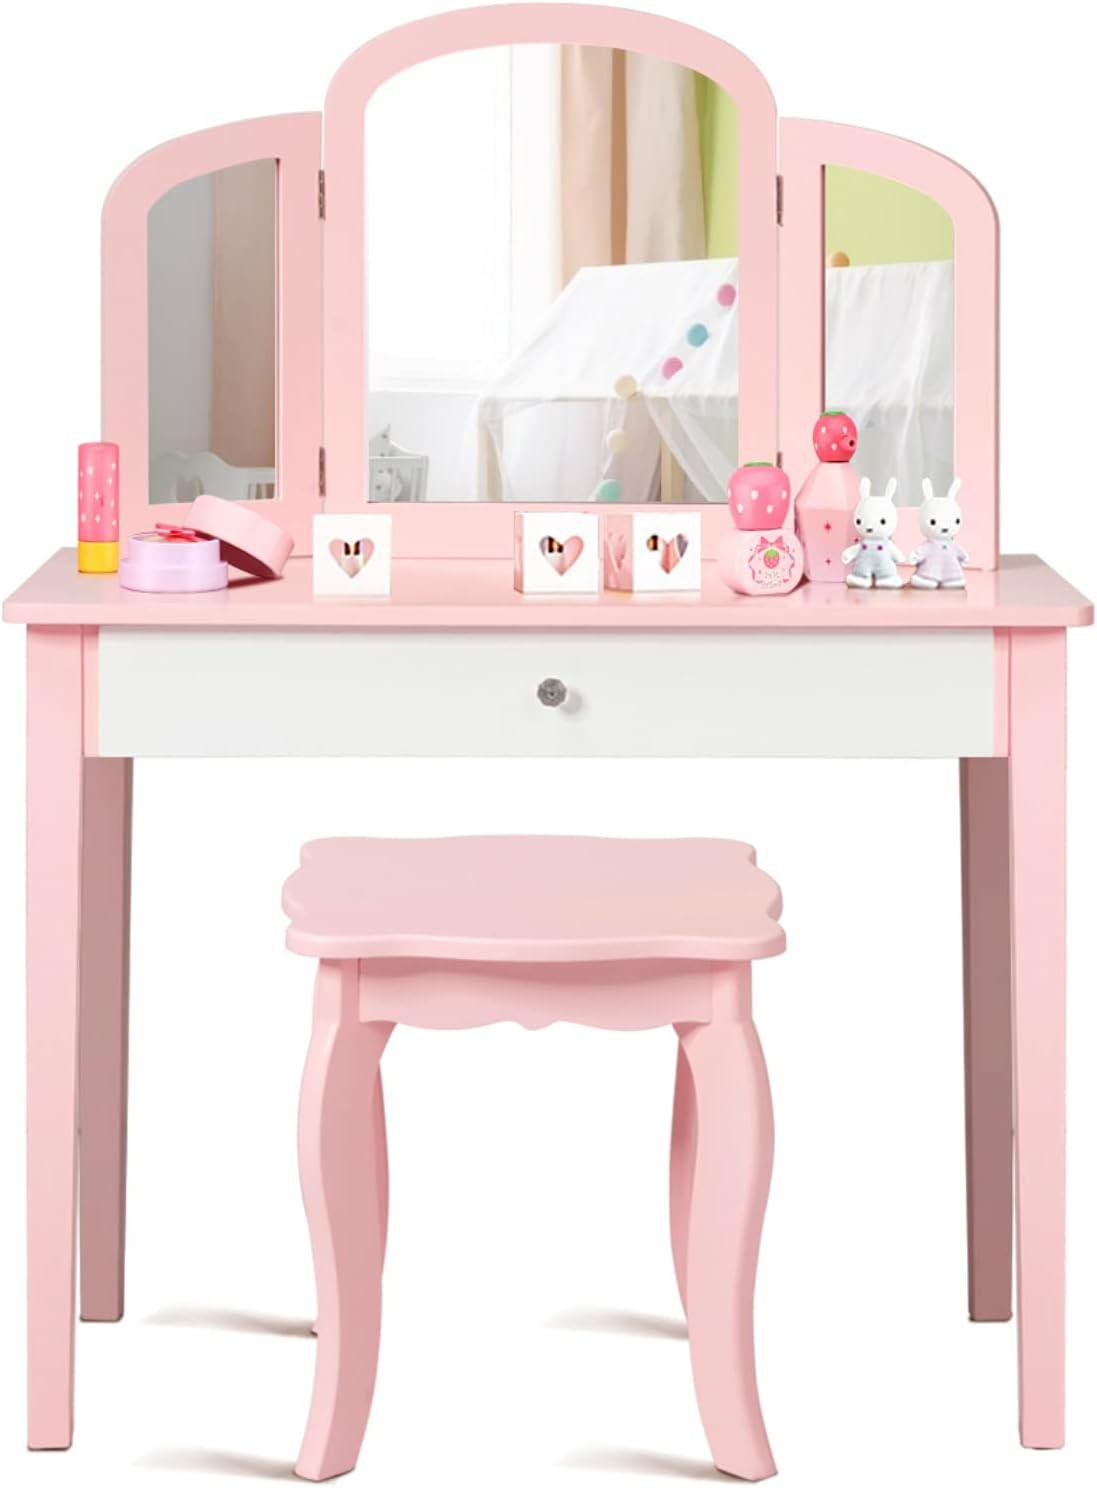 HONEY JOY Kids Vanity Set with Mirror Beauty Max 41% OFF cheap Toddler Makeup Dre